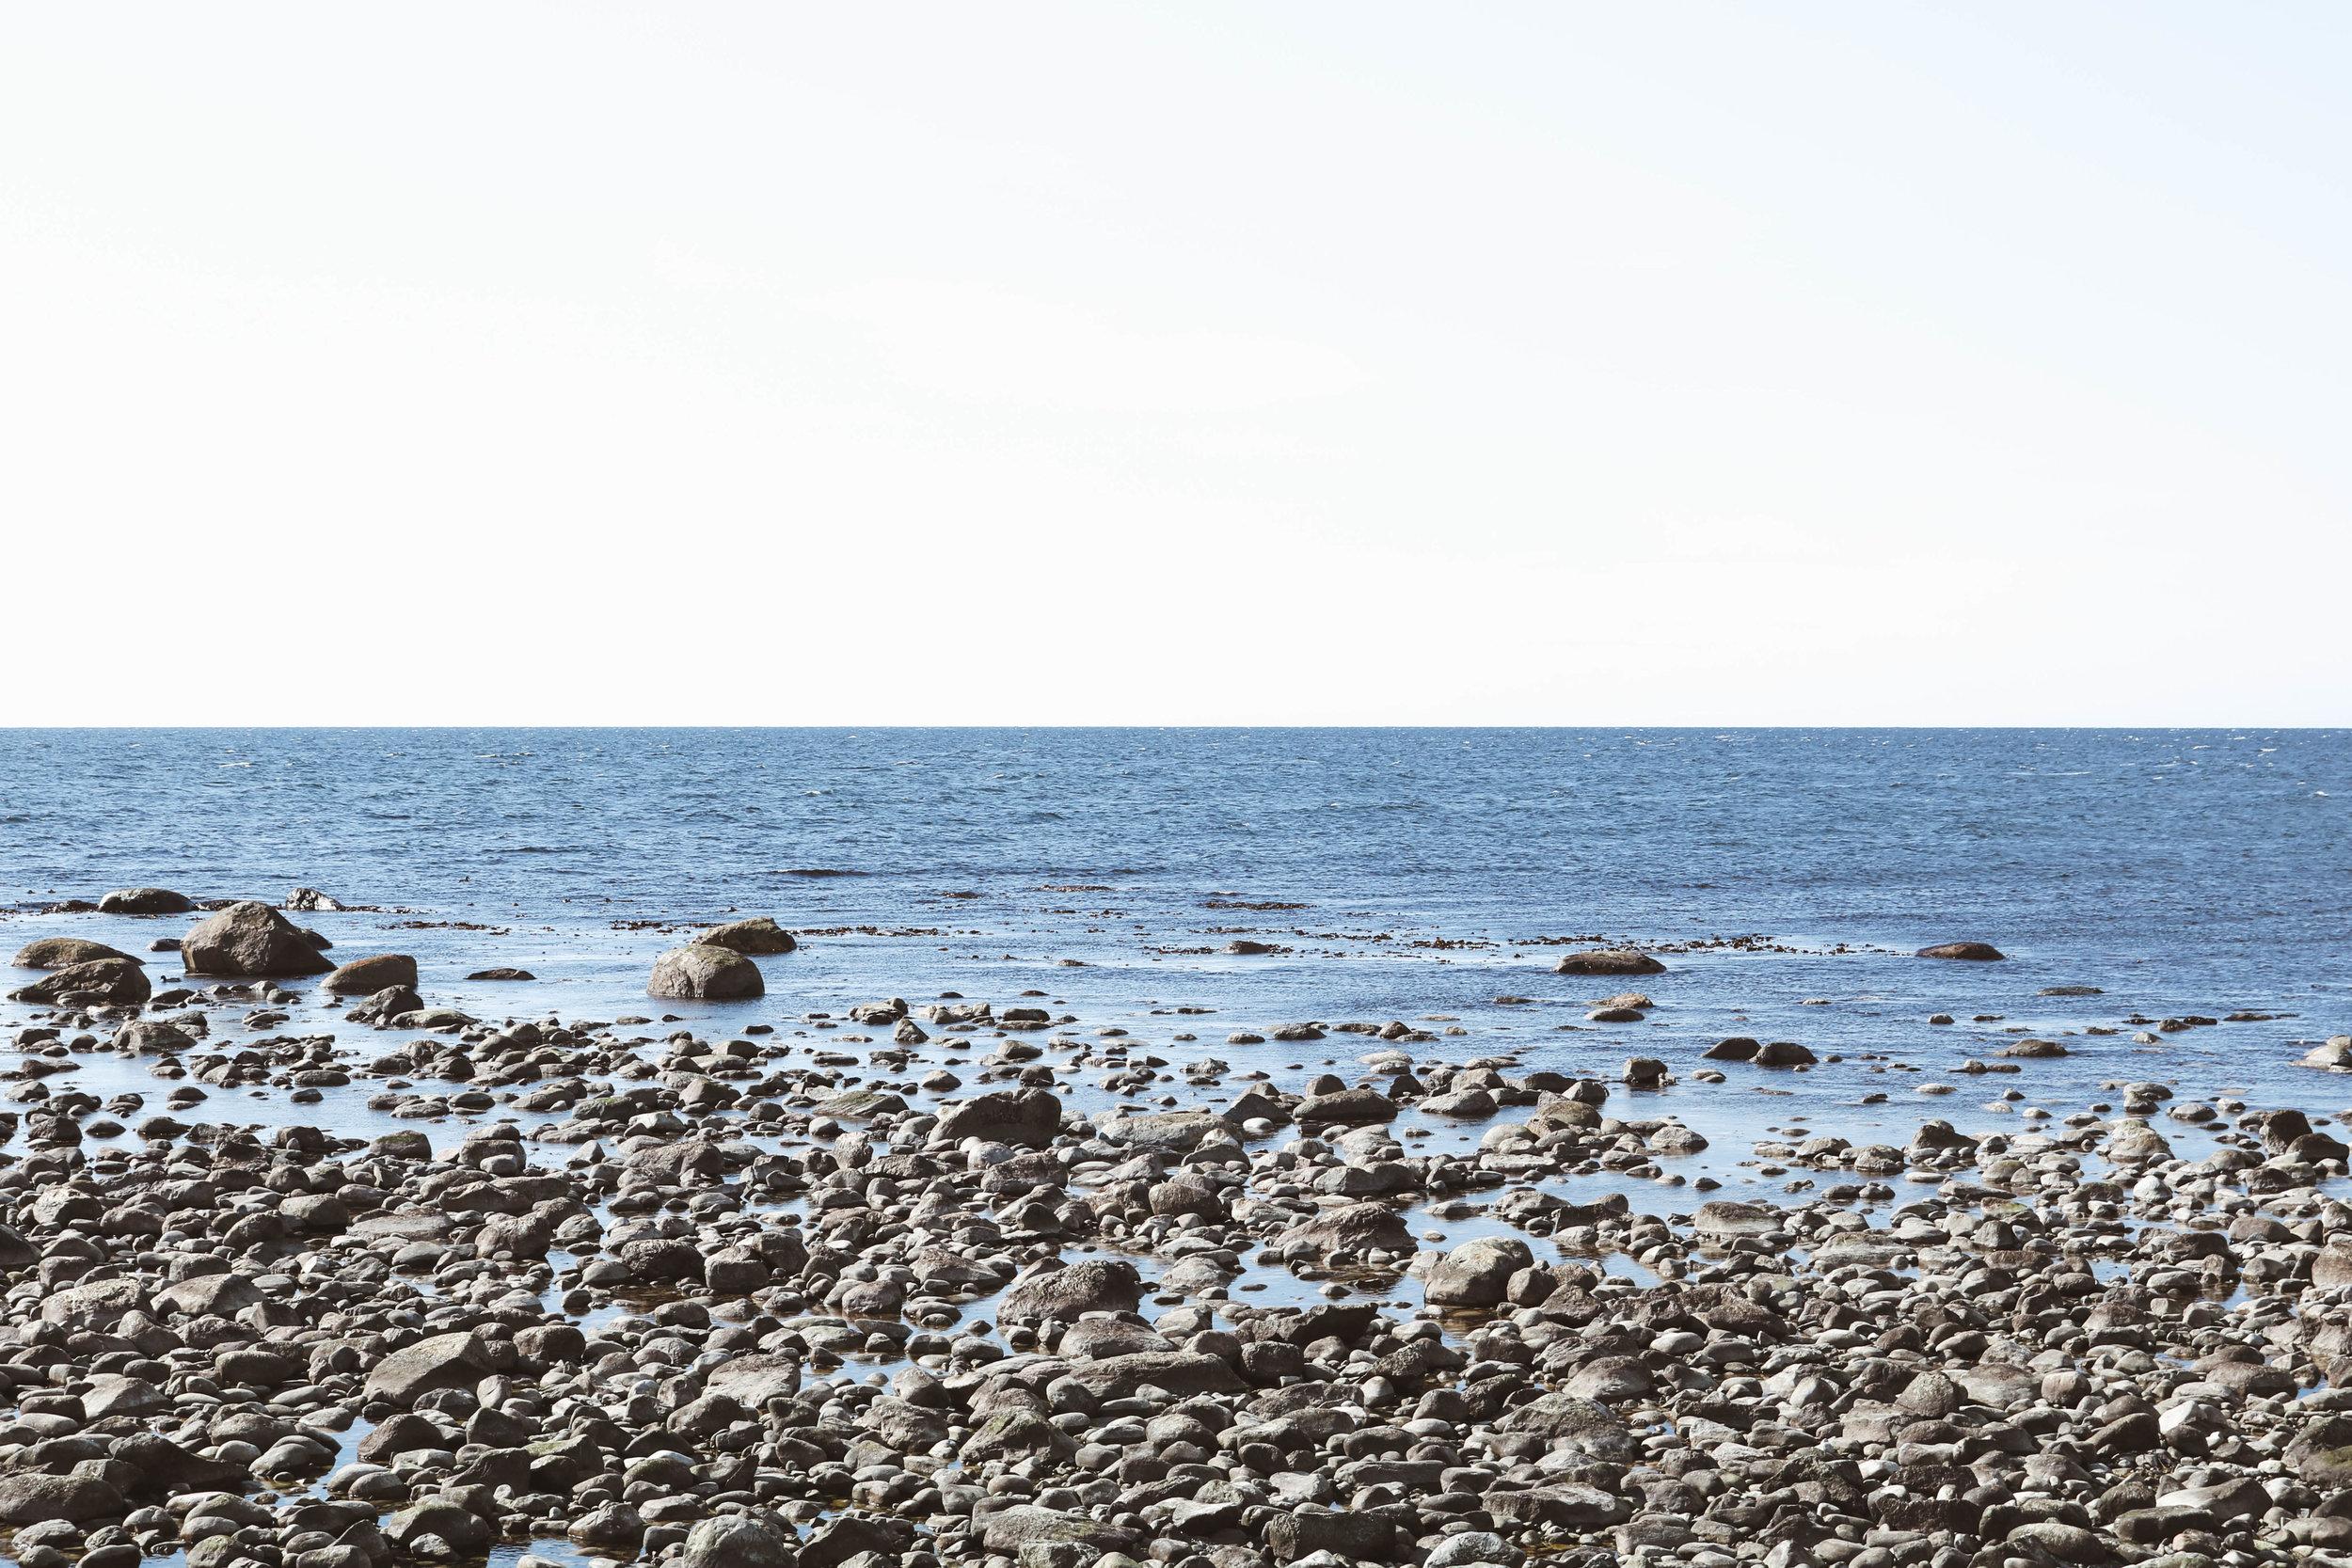 The Jæren coast near Stavanger